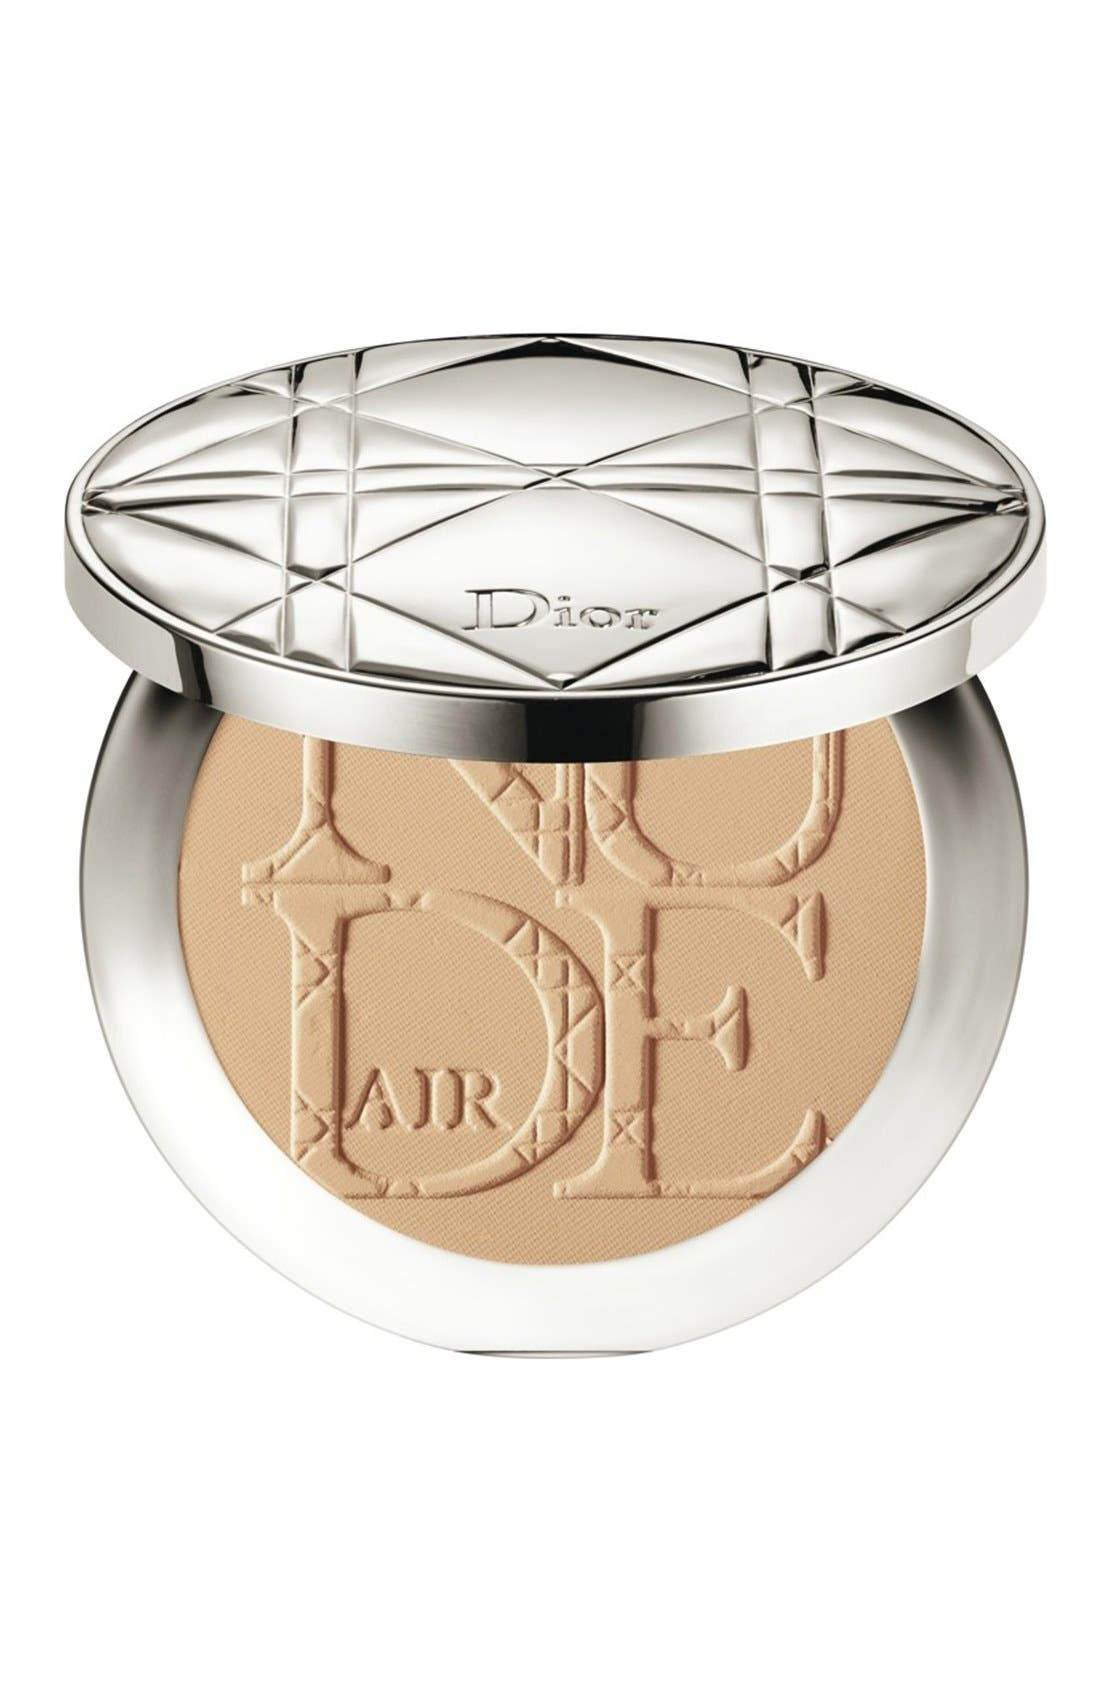 Dior 'Diorskin Nude Air' Healthy Glow Invisible Powder